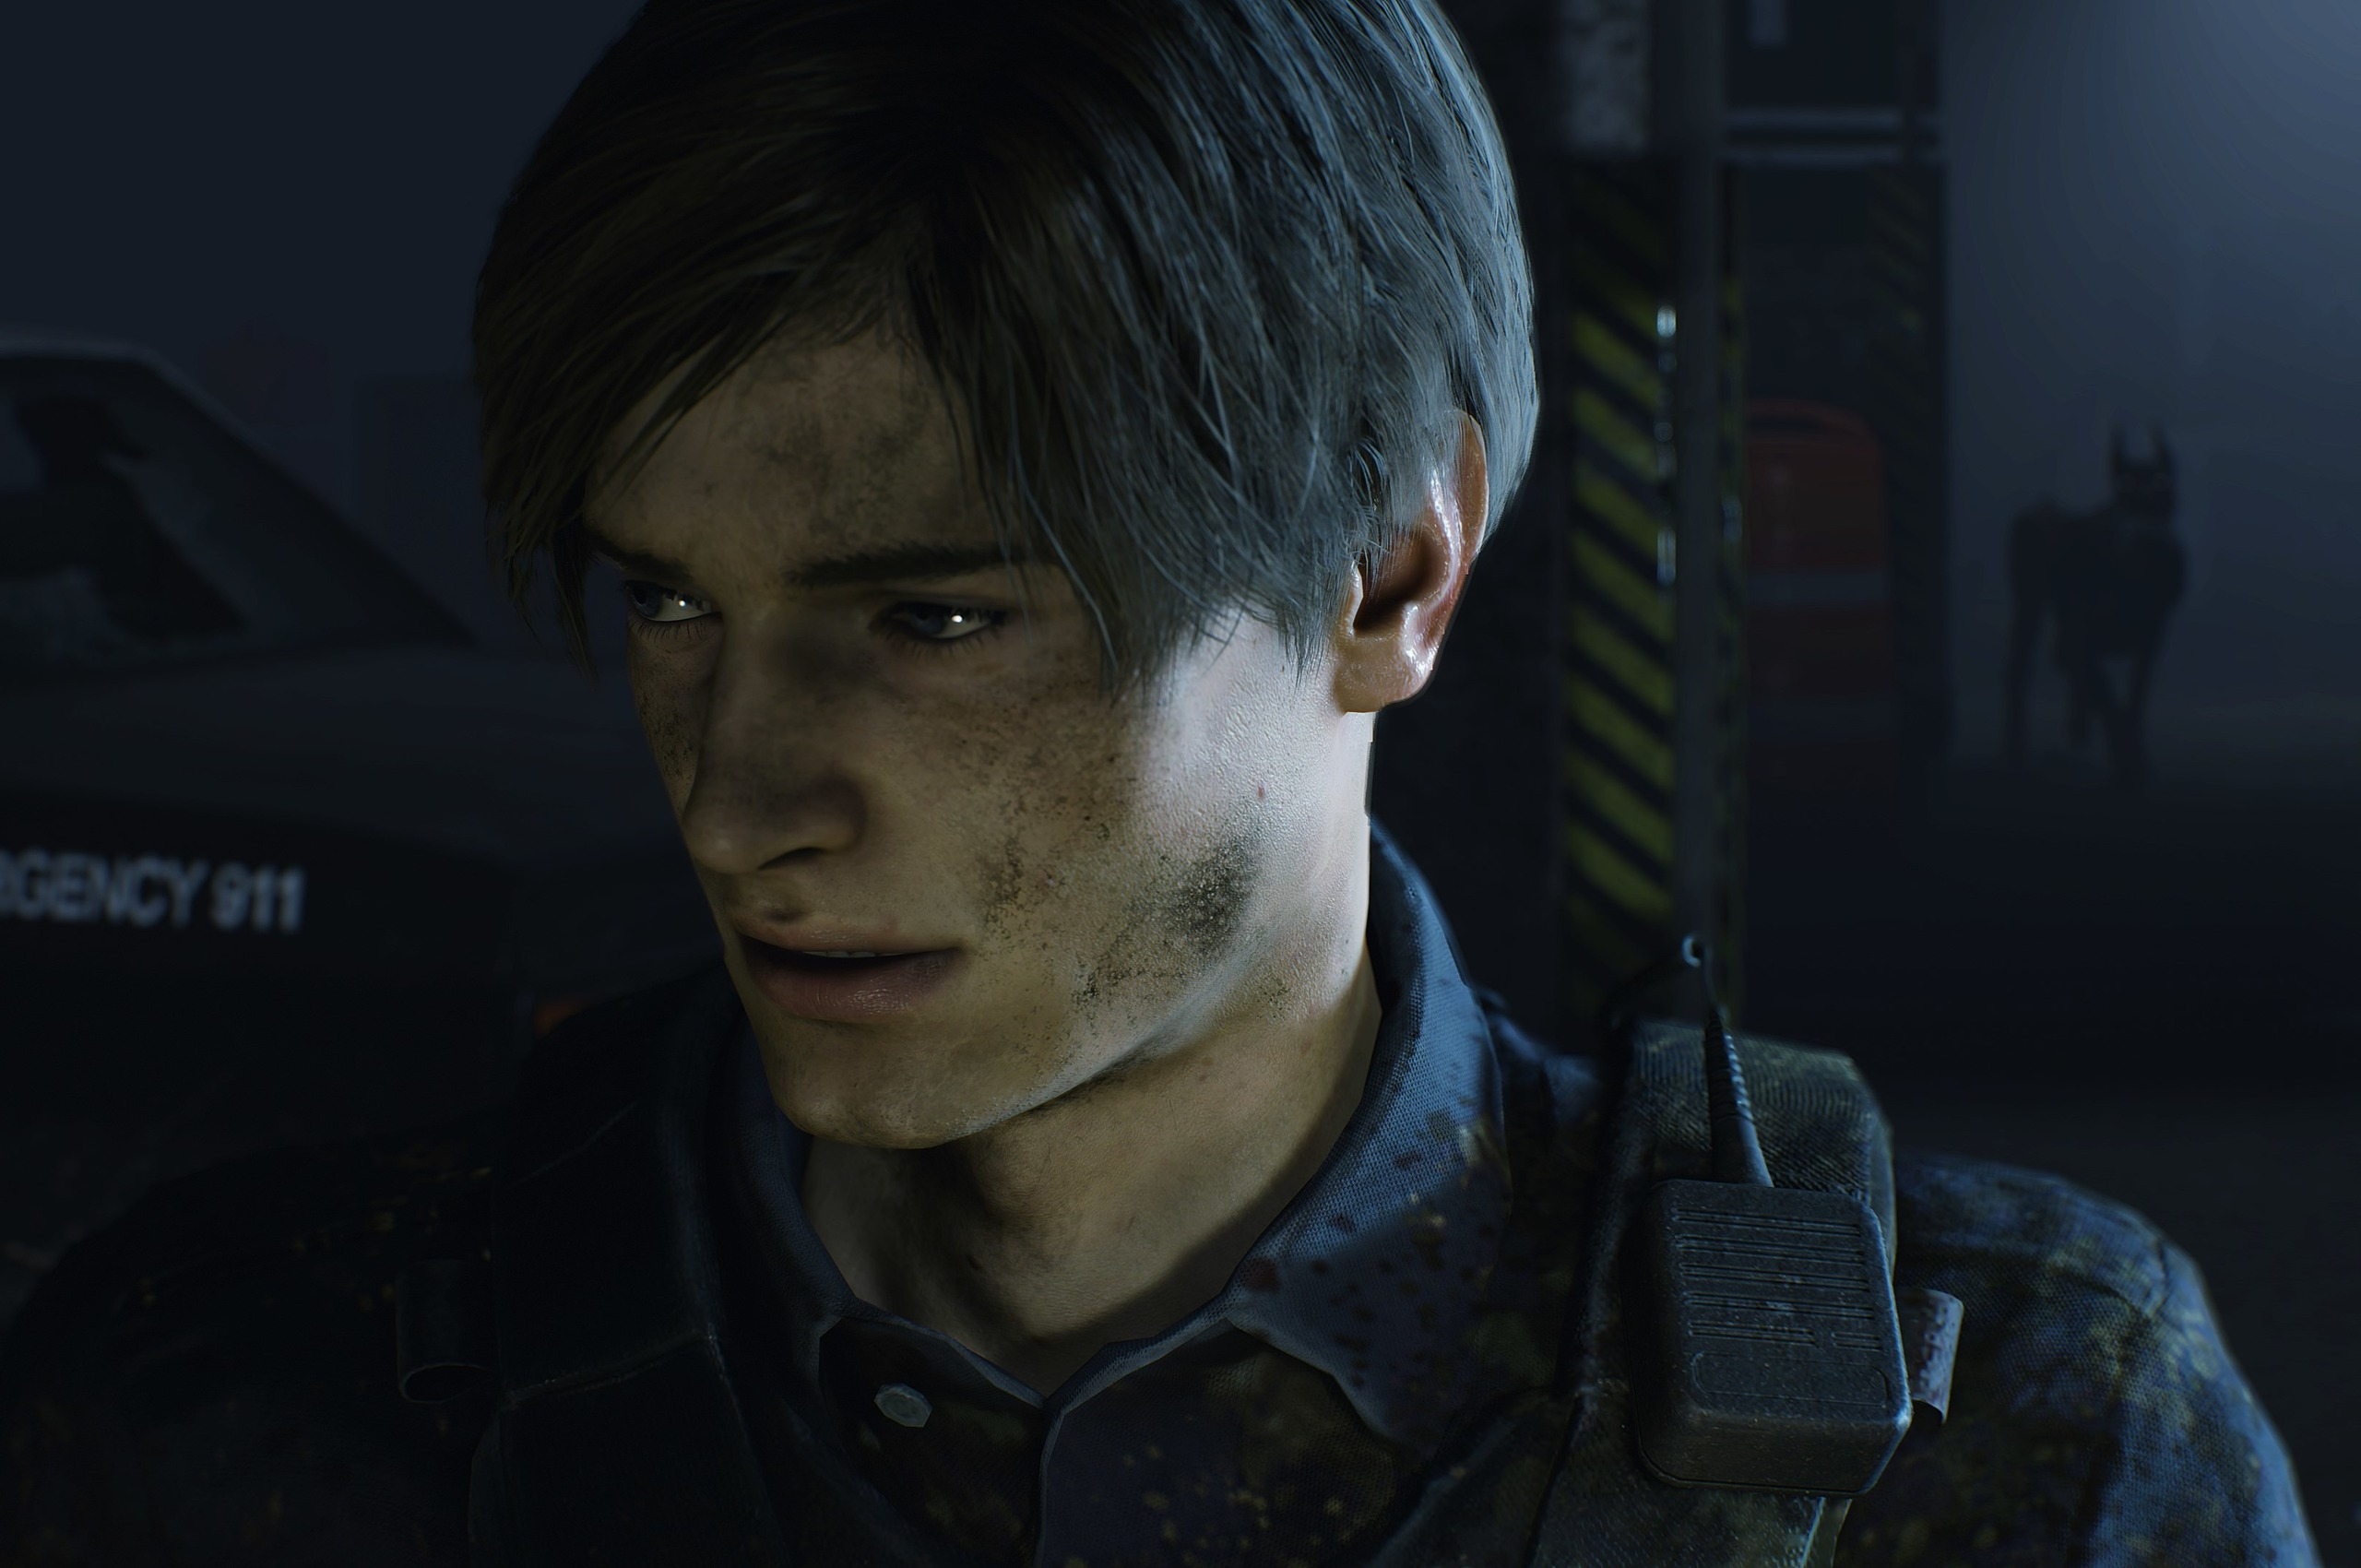 2560x1700 Leon Kennedy Resident Evil 2 2019 4k Chromebook Pixel Hd